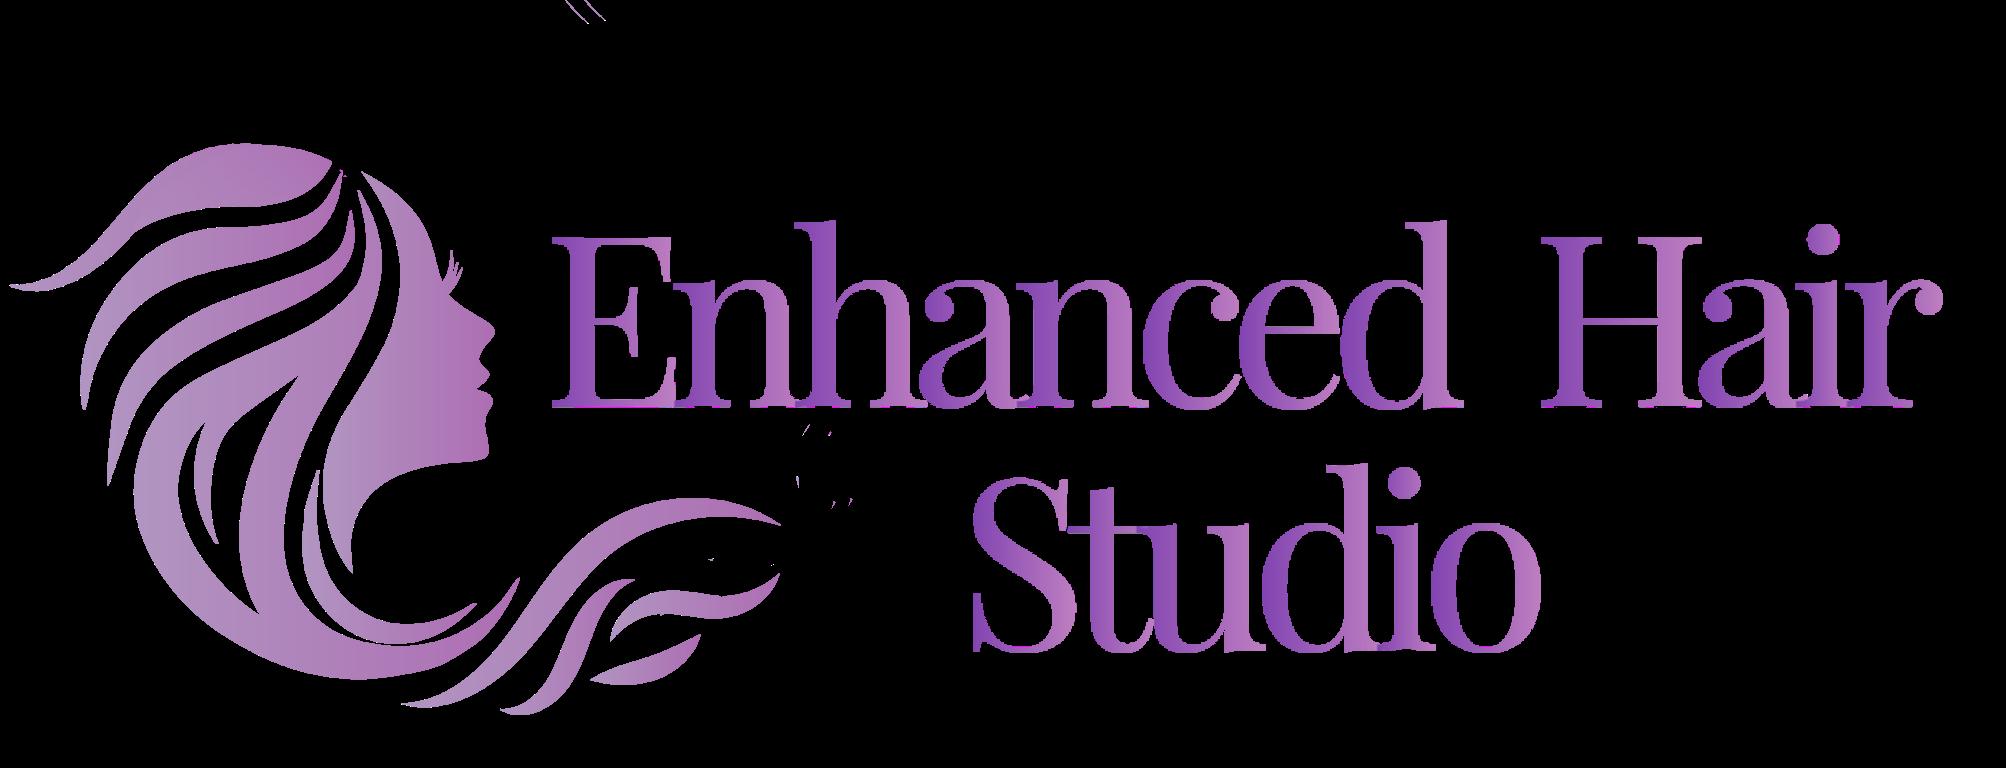 Enhanced Hair Studio logo